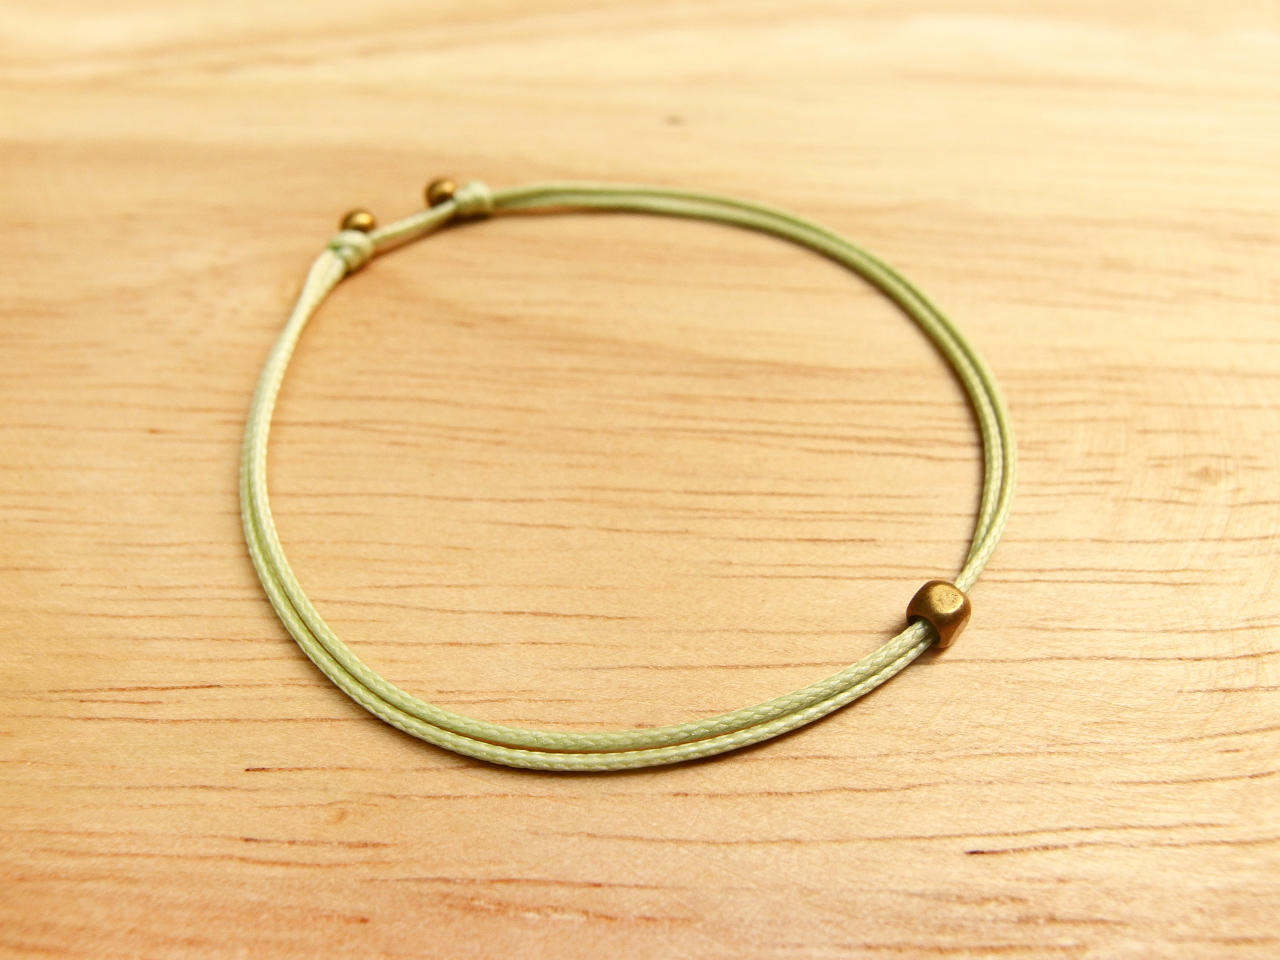 Charlene-牽引手環-飾品尺寸有S、M、L,此頁S+淺果綠細線,編號SYM08